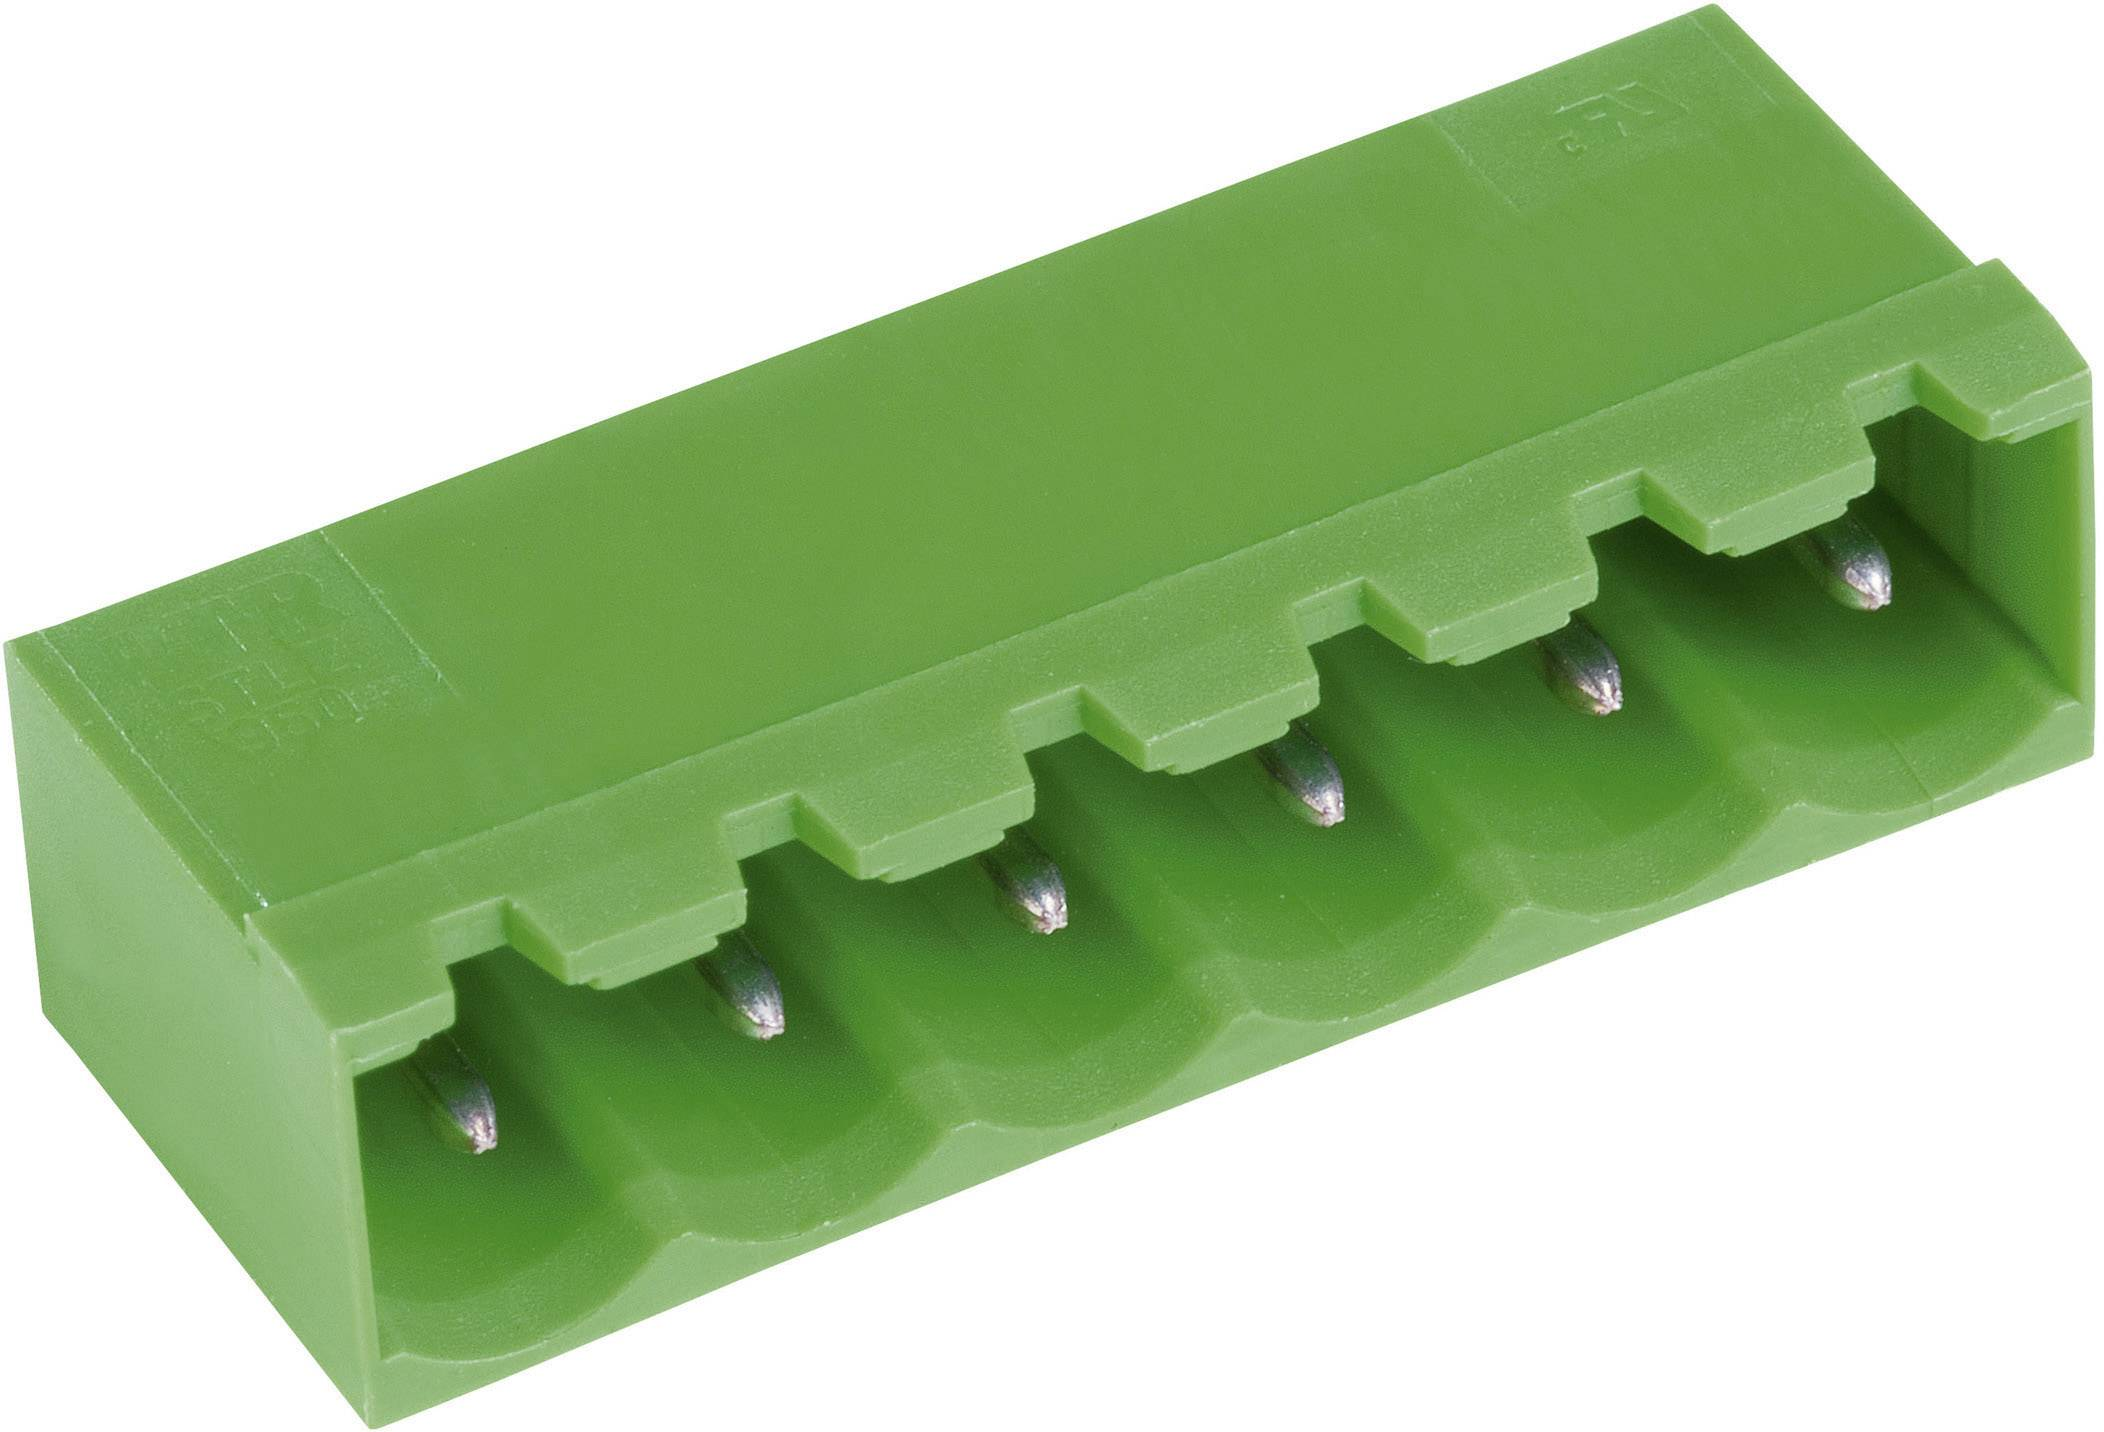 Konektor do DPS PTR STL950/8G-5.0-H 50950085001D, 41.20 mm, pólů 8, rozteč 5 mm, 1 ks